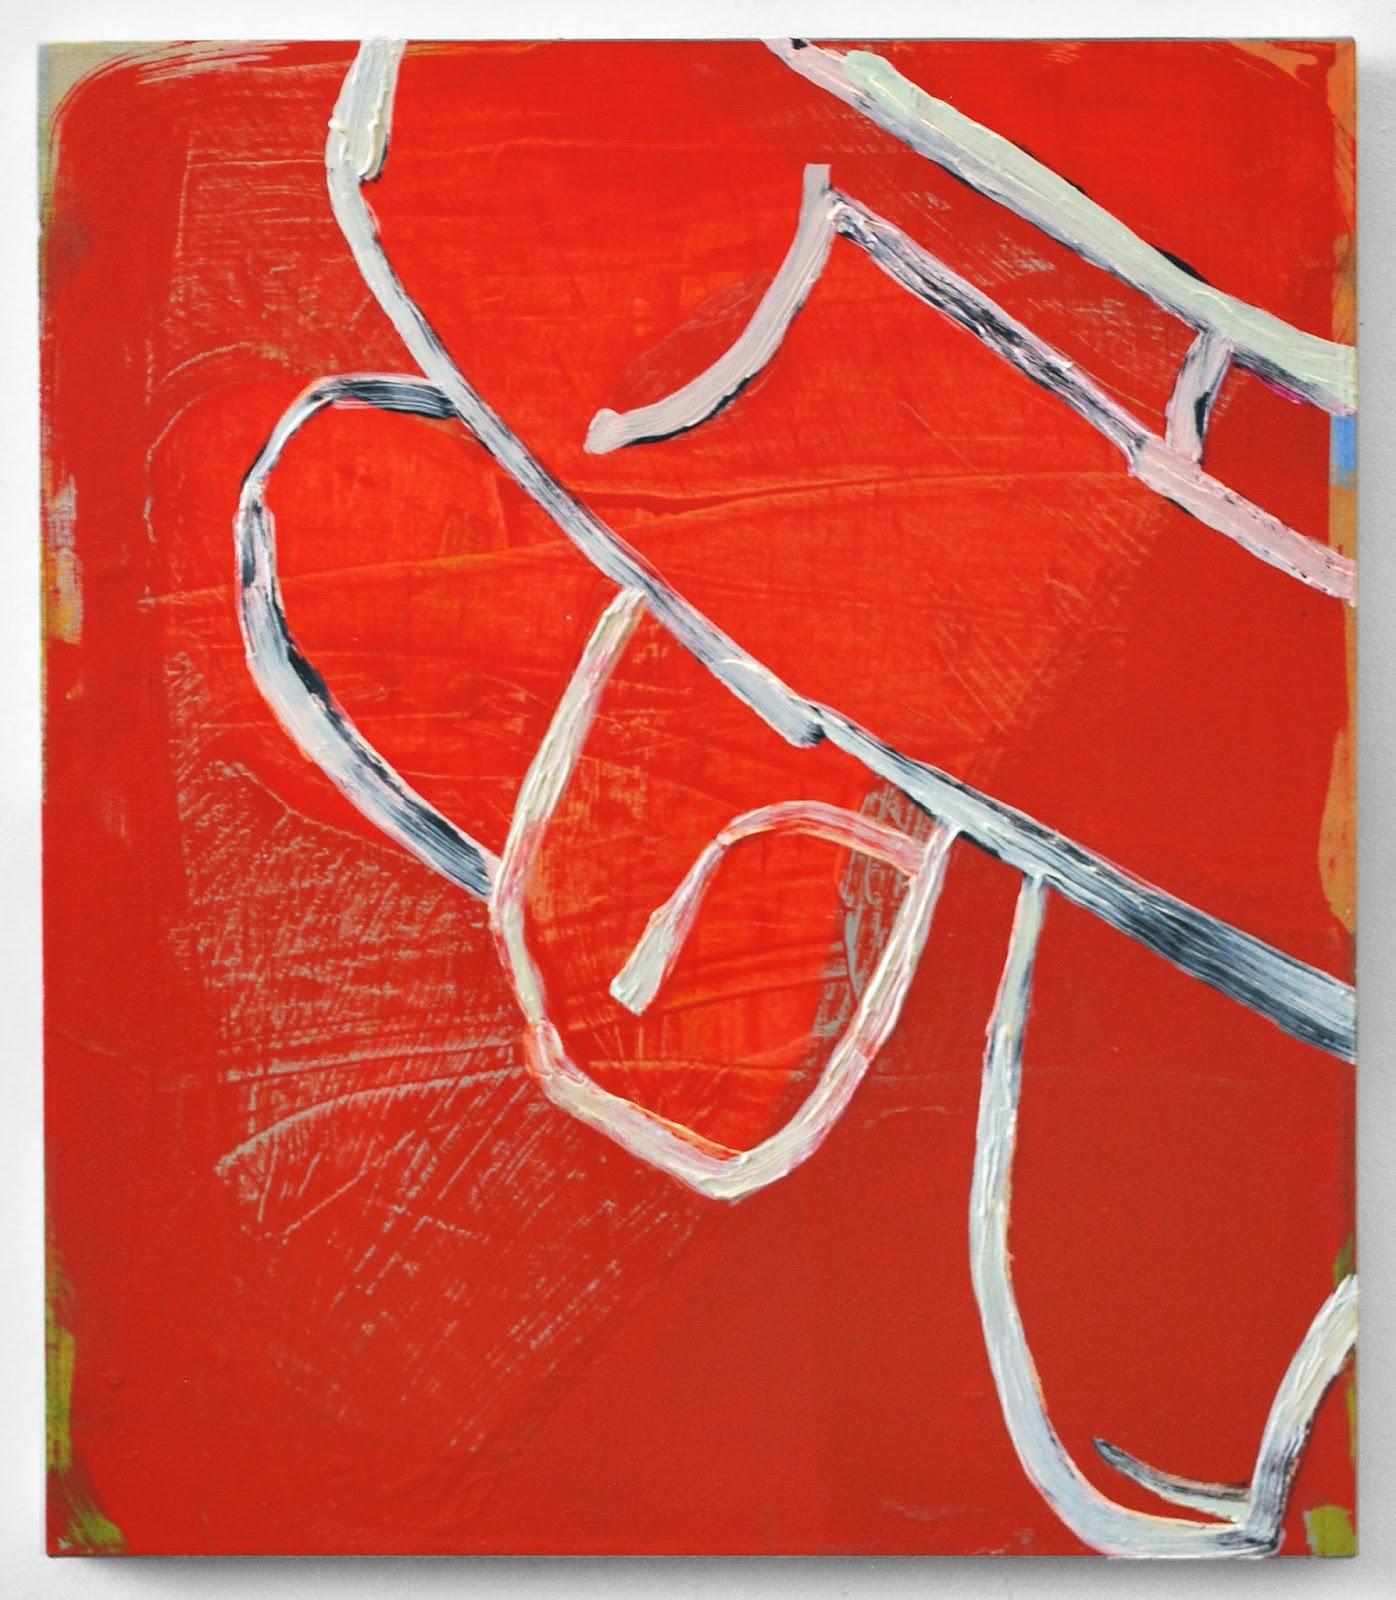 Painter's Bread: 2015